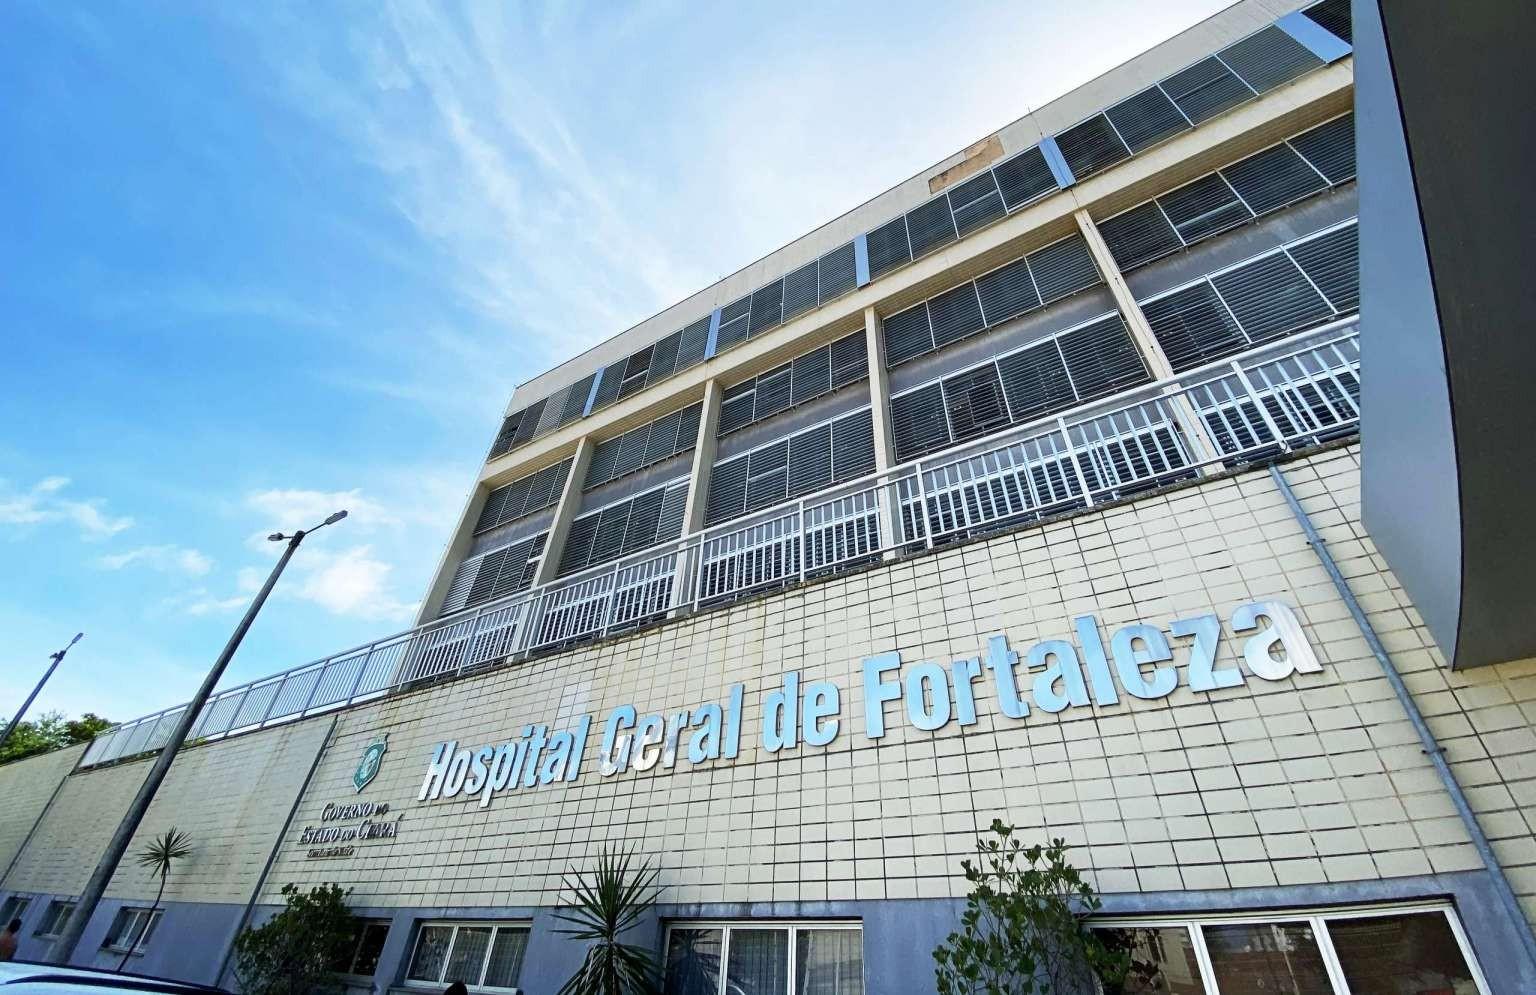 Concurso Funsaúde: gabarito preliminar deve ser divulgado nesta terça-feira